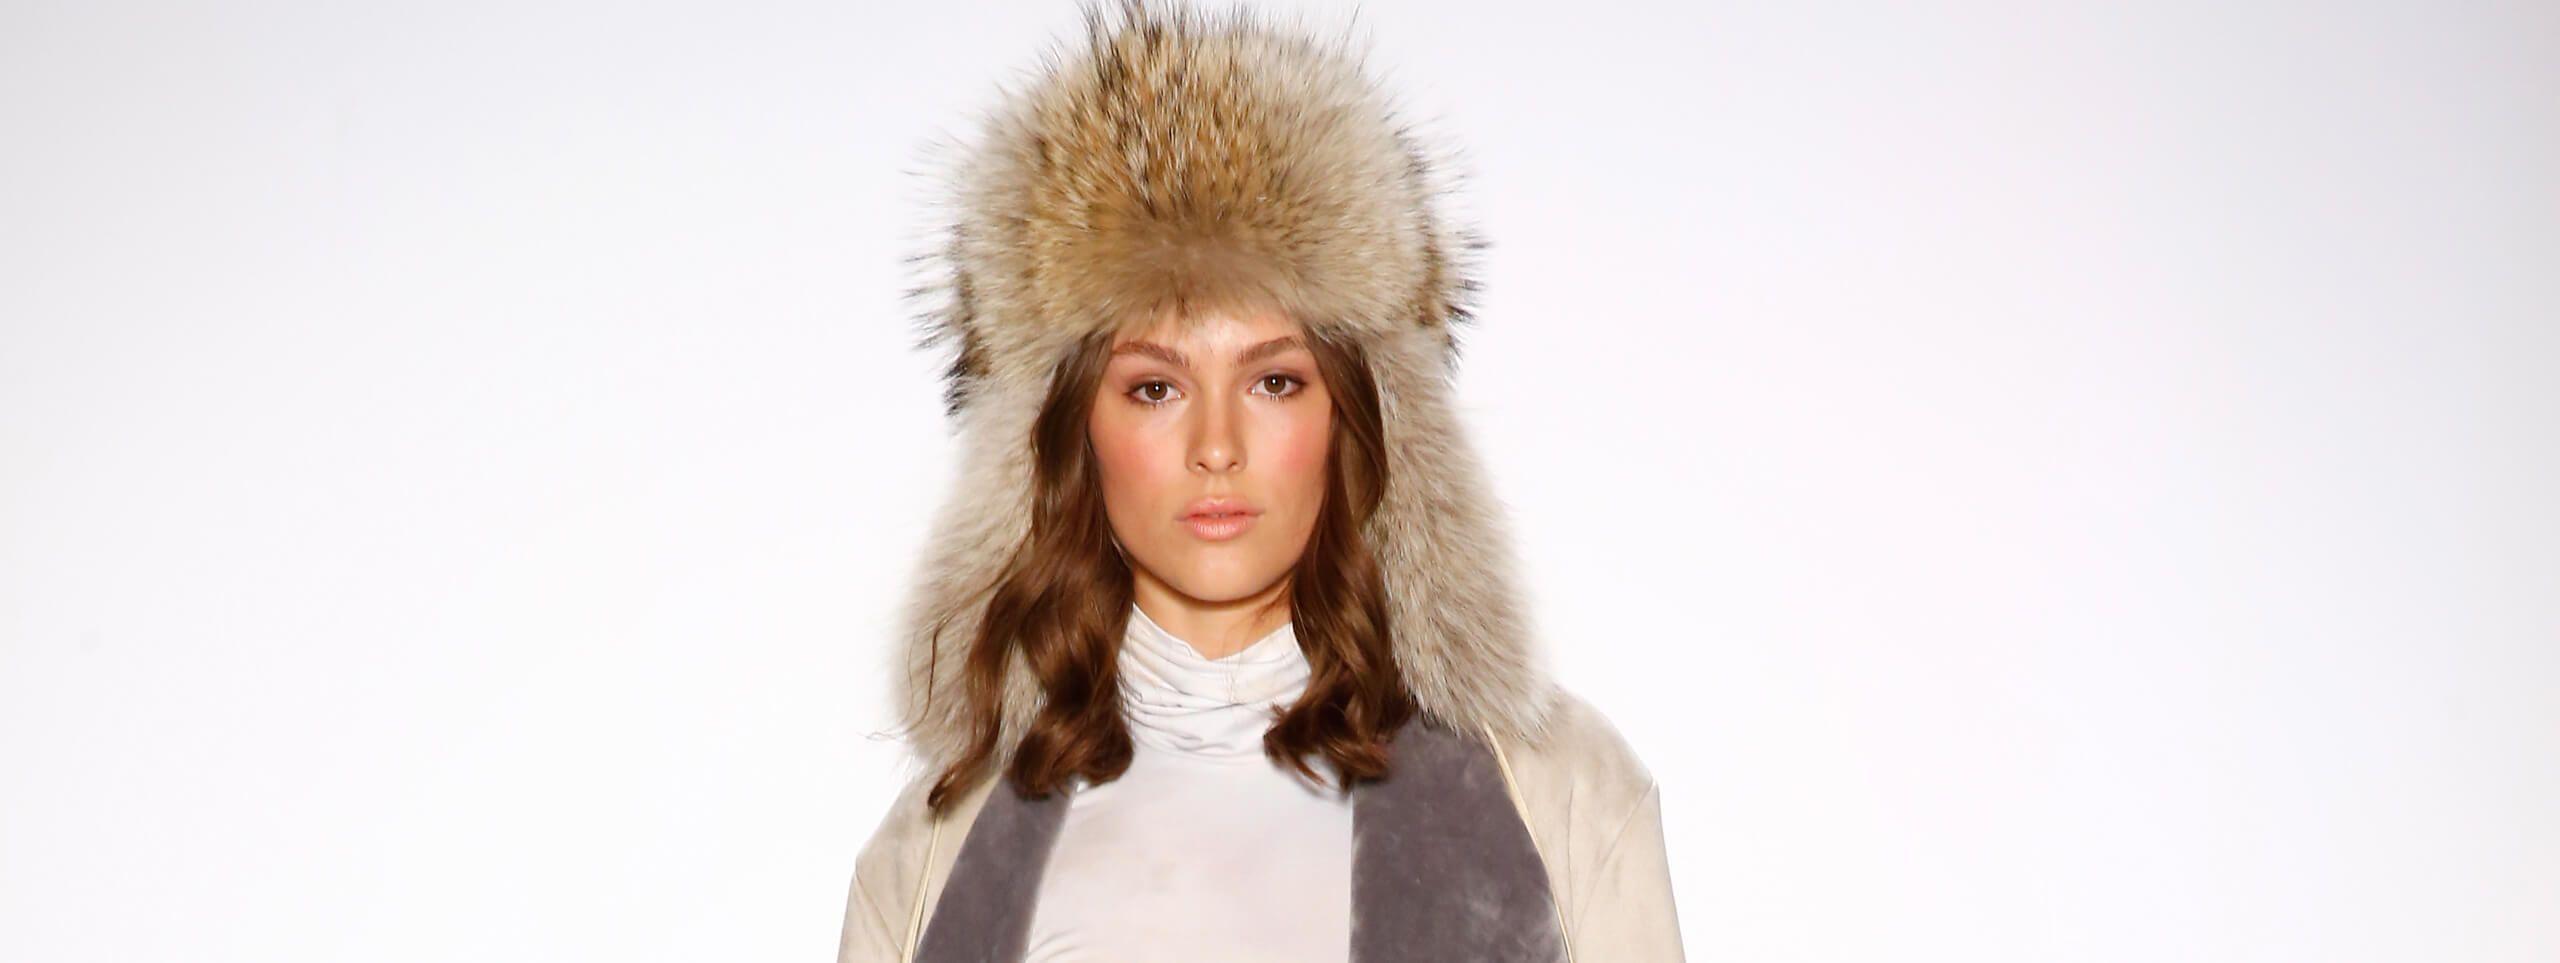 Woman wears brown wavy hairstyle under winter hat